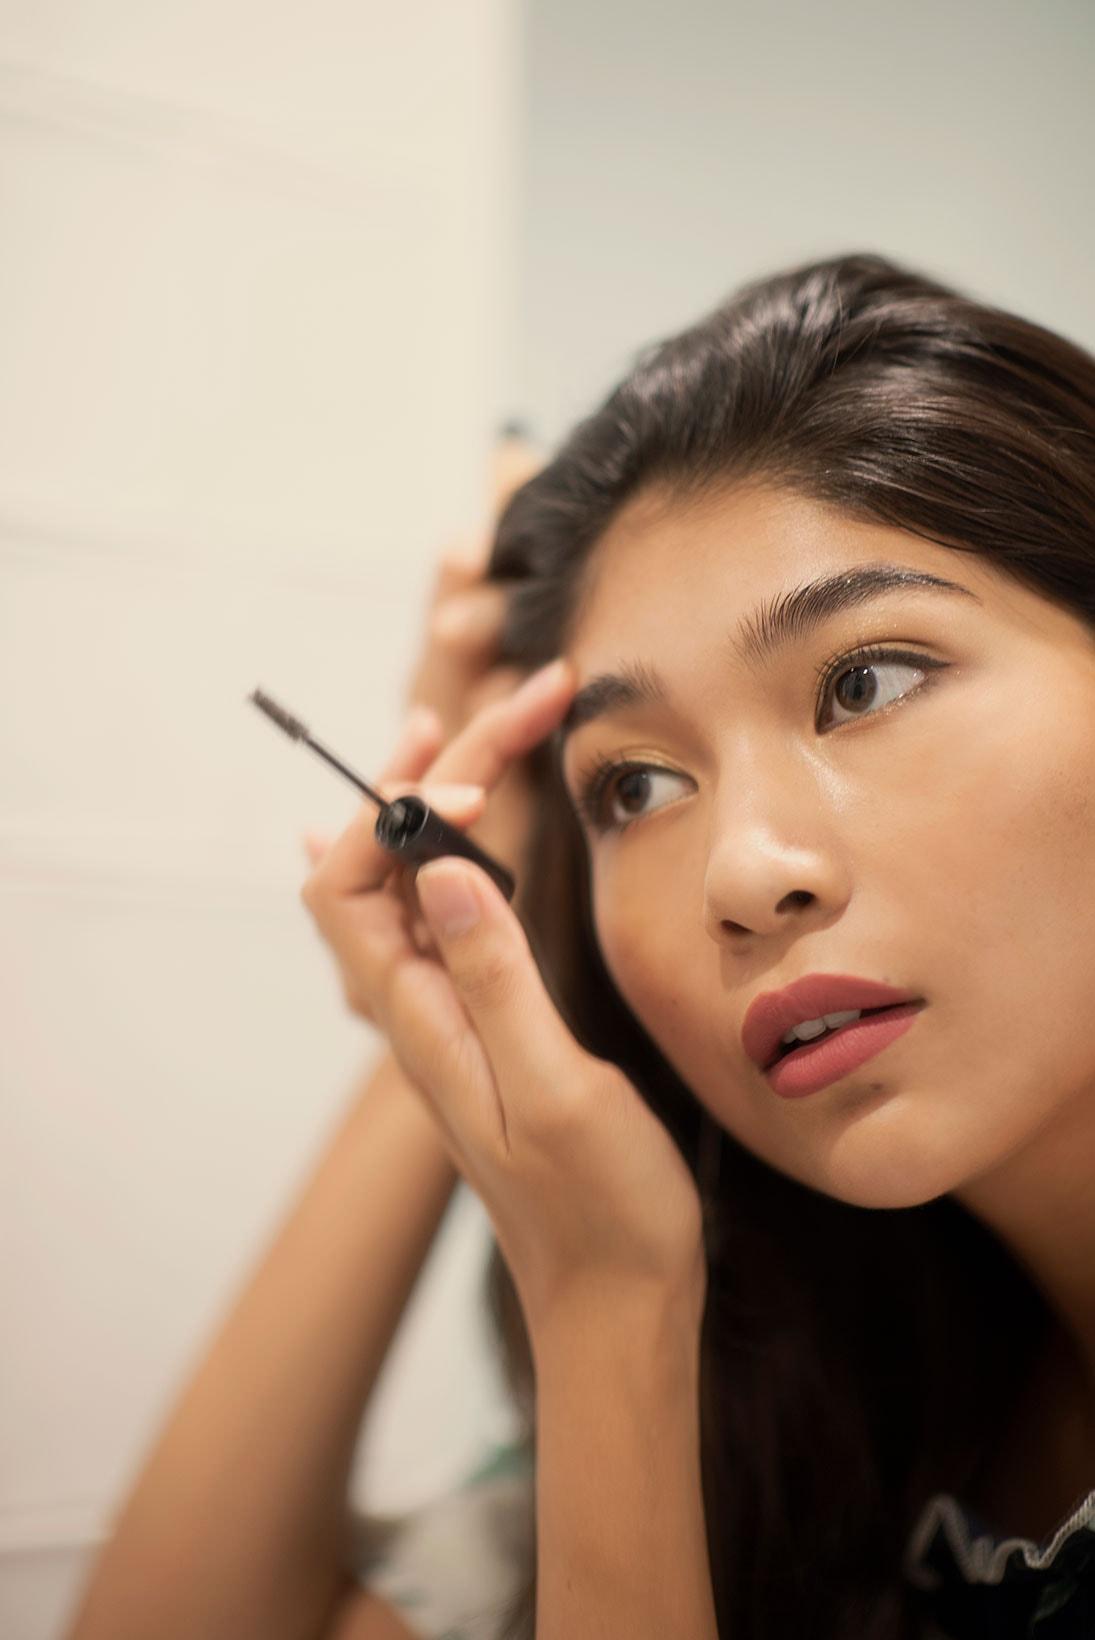 miss world japan priyanka yoshikawa beauty pageant makeup skincare india racism